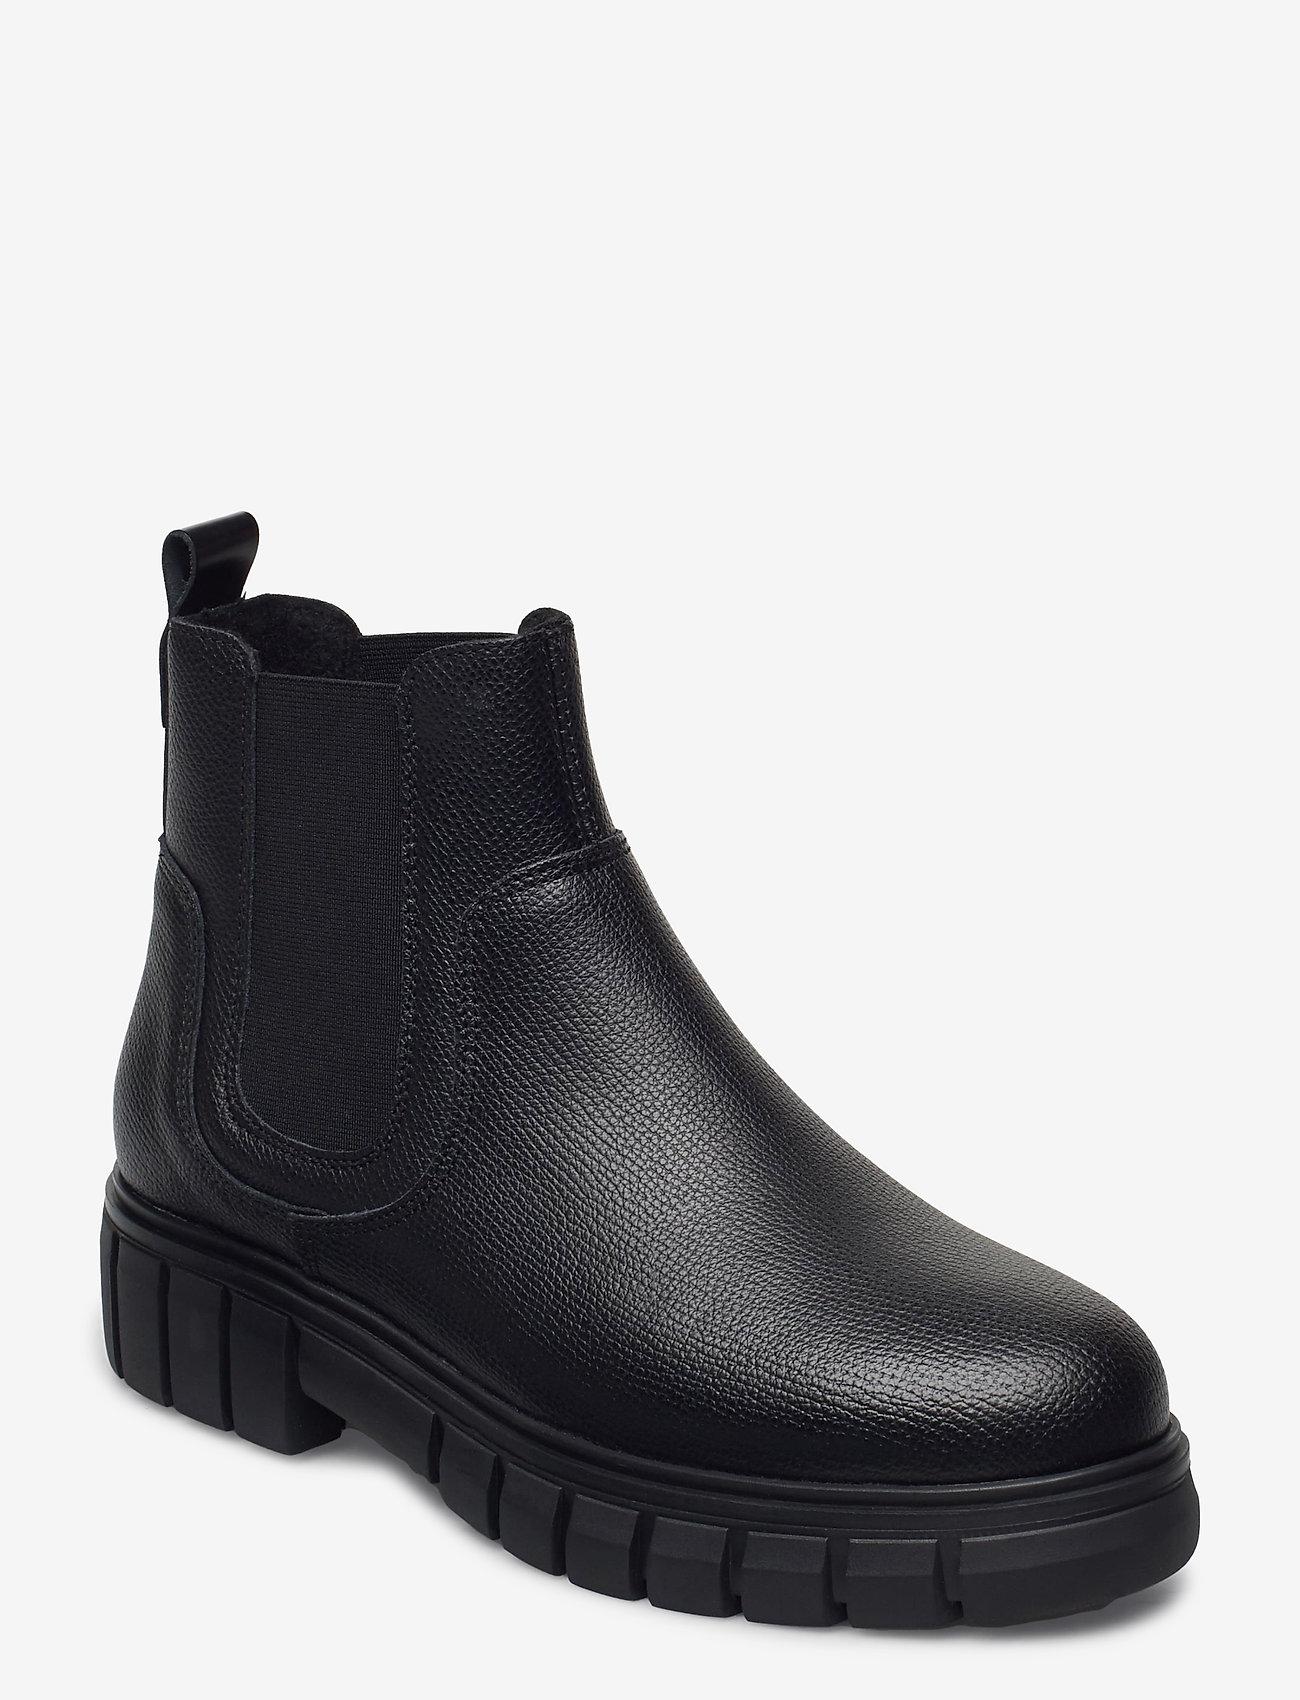 Shoe The Bear - STB-REBEL CHELSEA WARM L - chelsea boots - black - 0